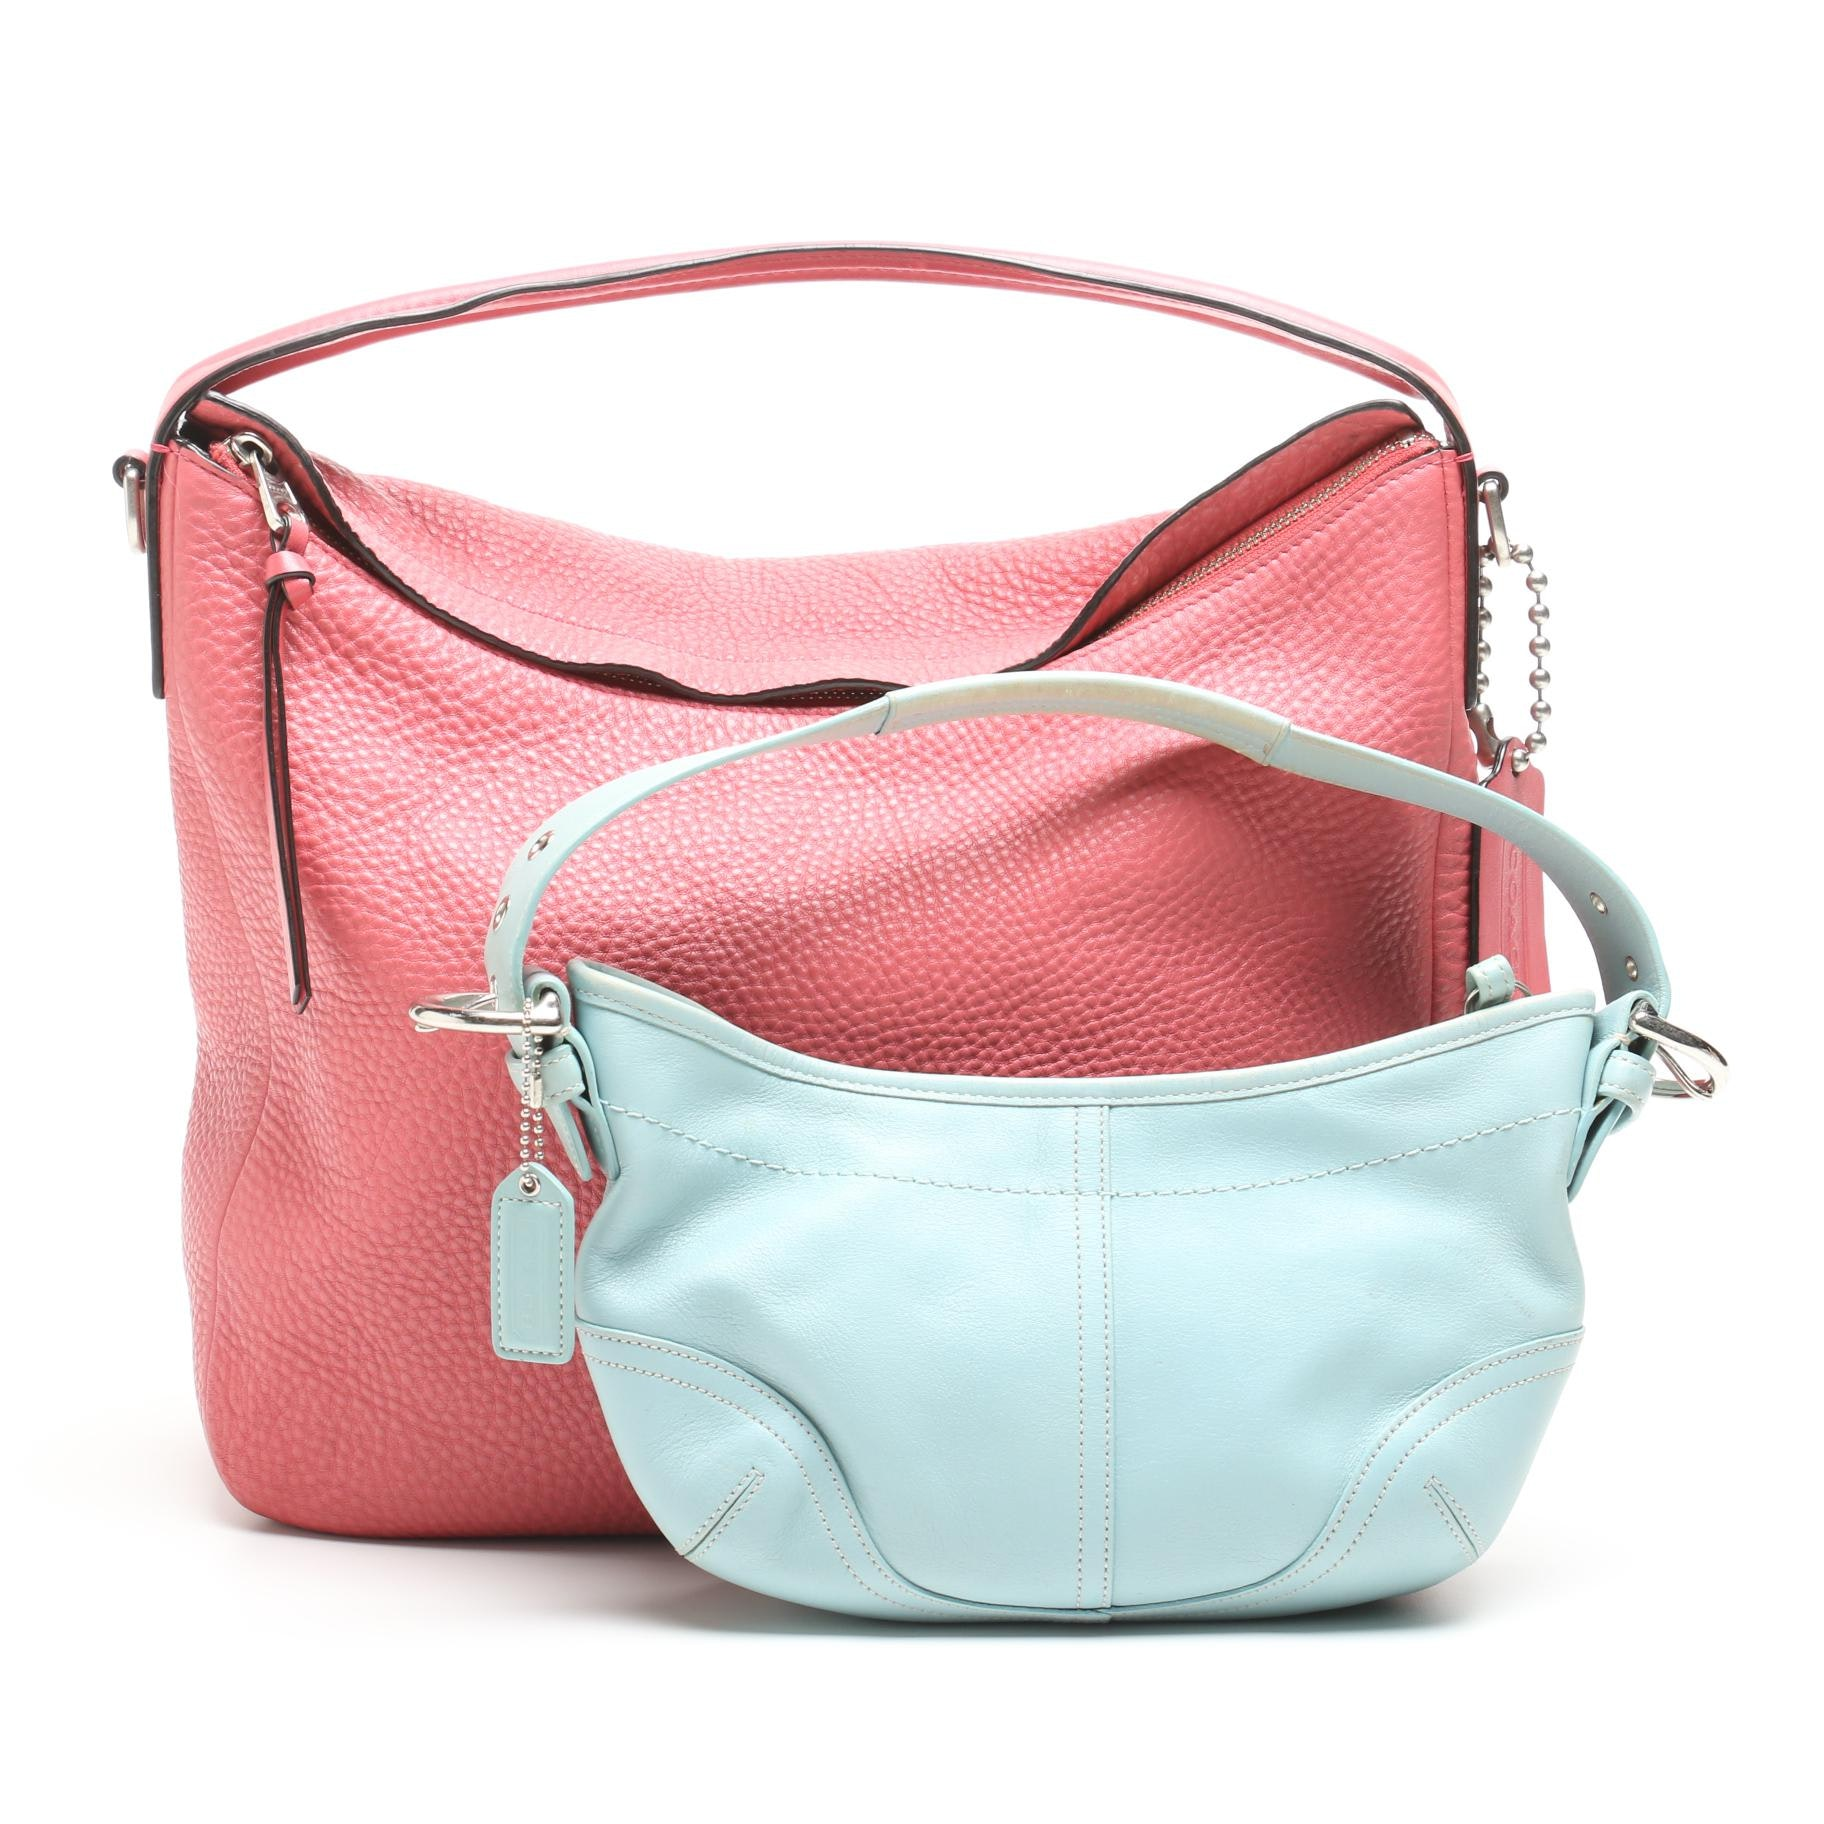 coach bleecker pebbled leather sullivan hobo bag and soho small demi rh ebth com